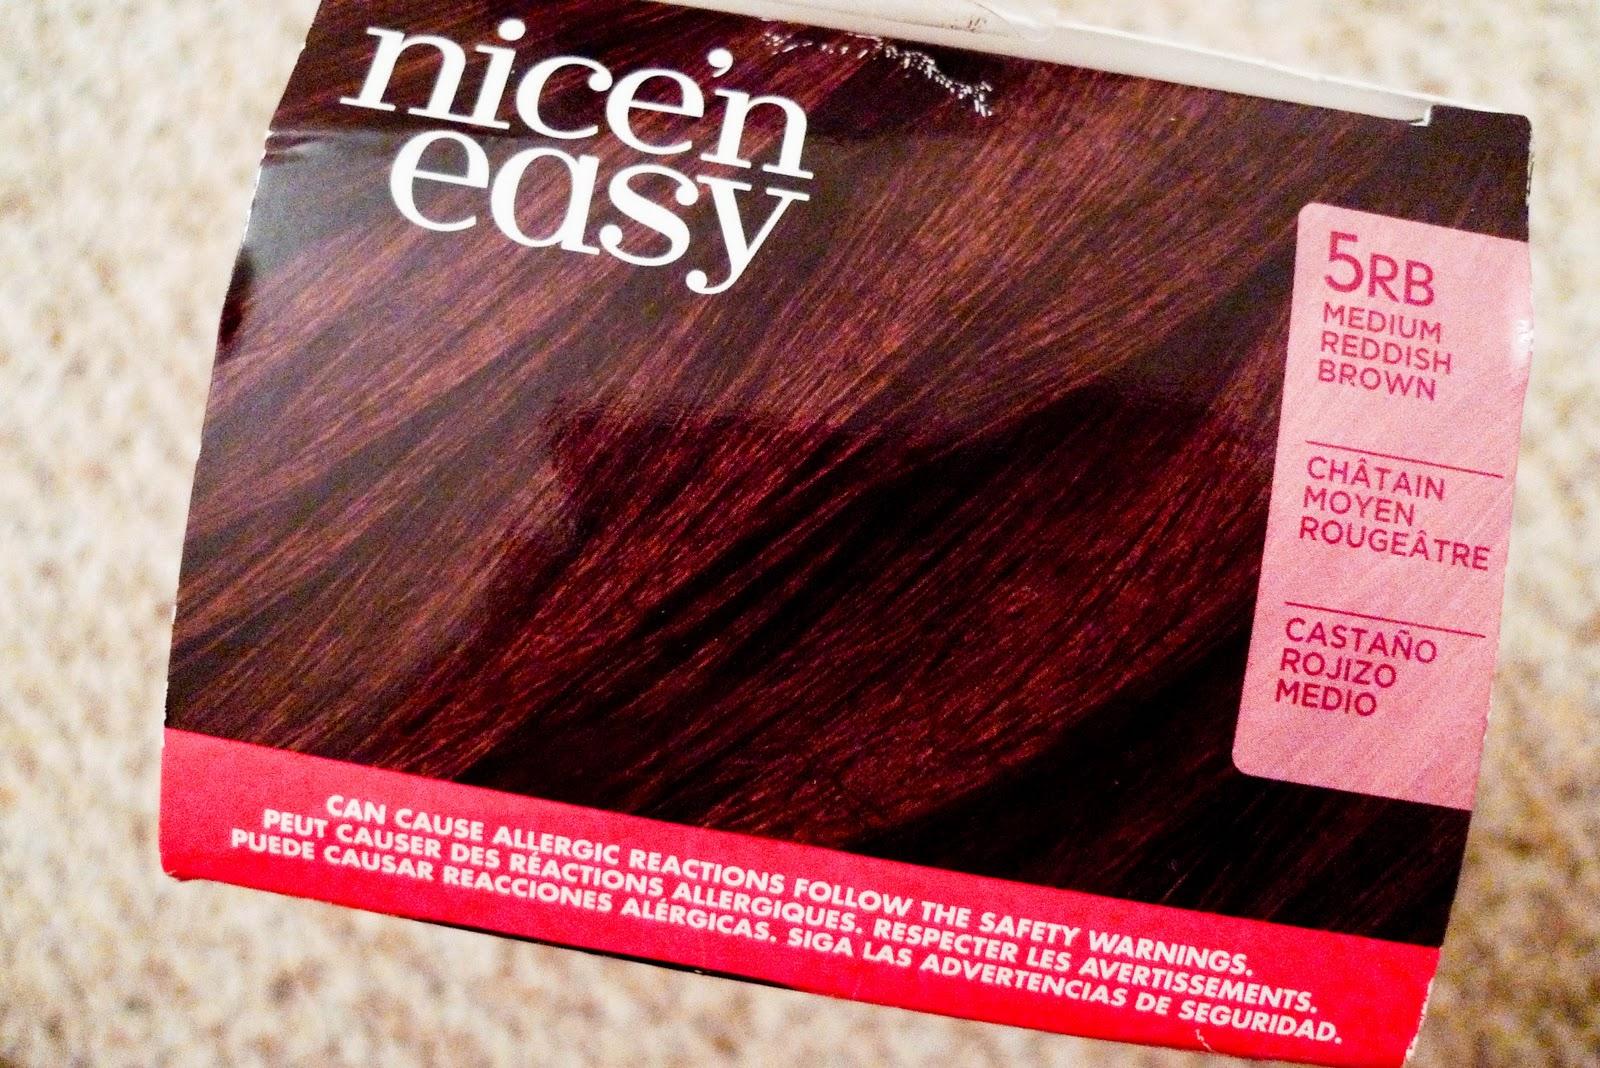 Winnietsuii New Hair Color Clairol Nicen Easy Color Blend Foam In